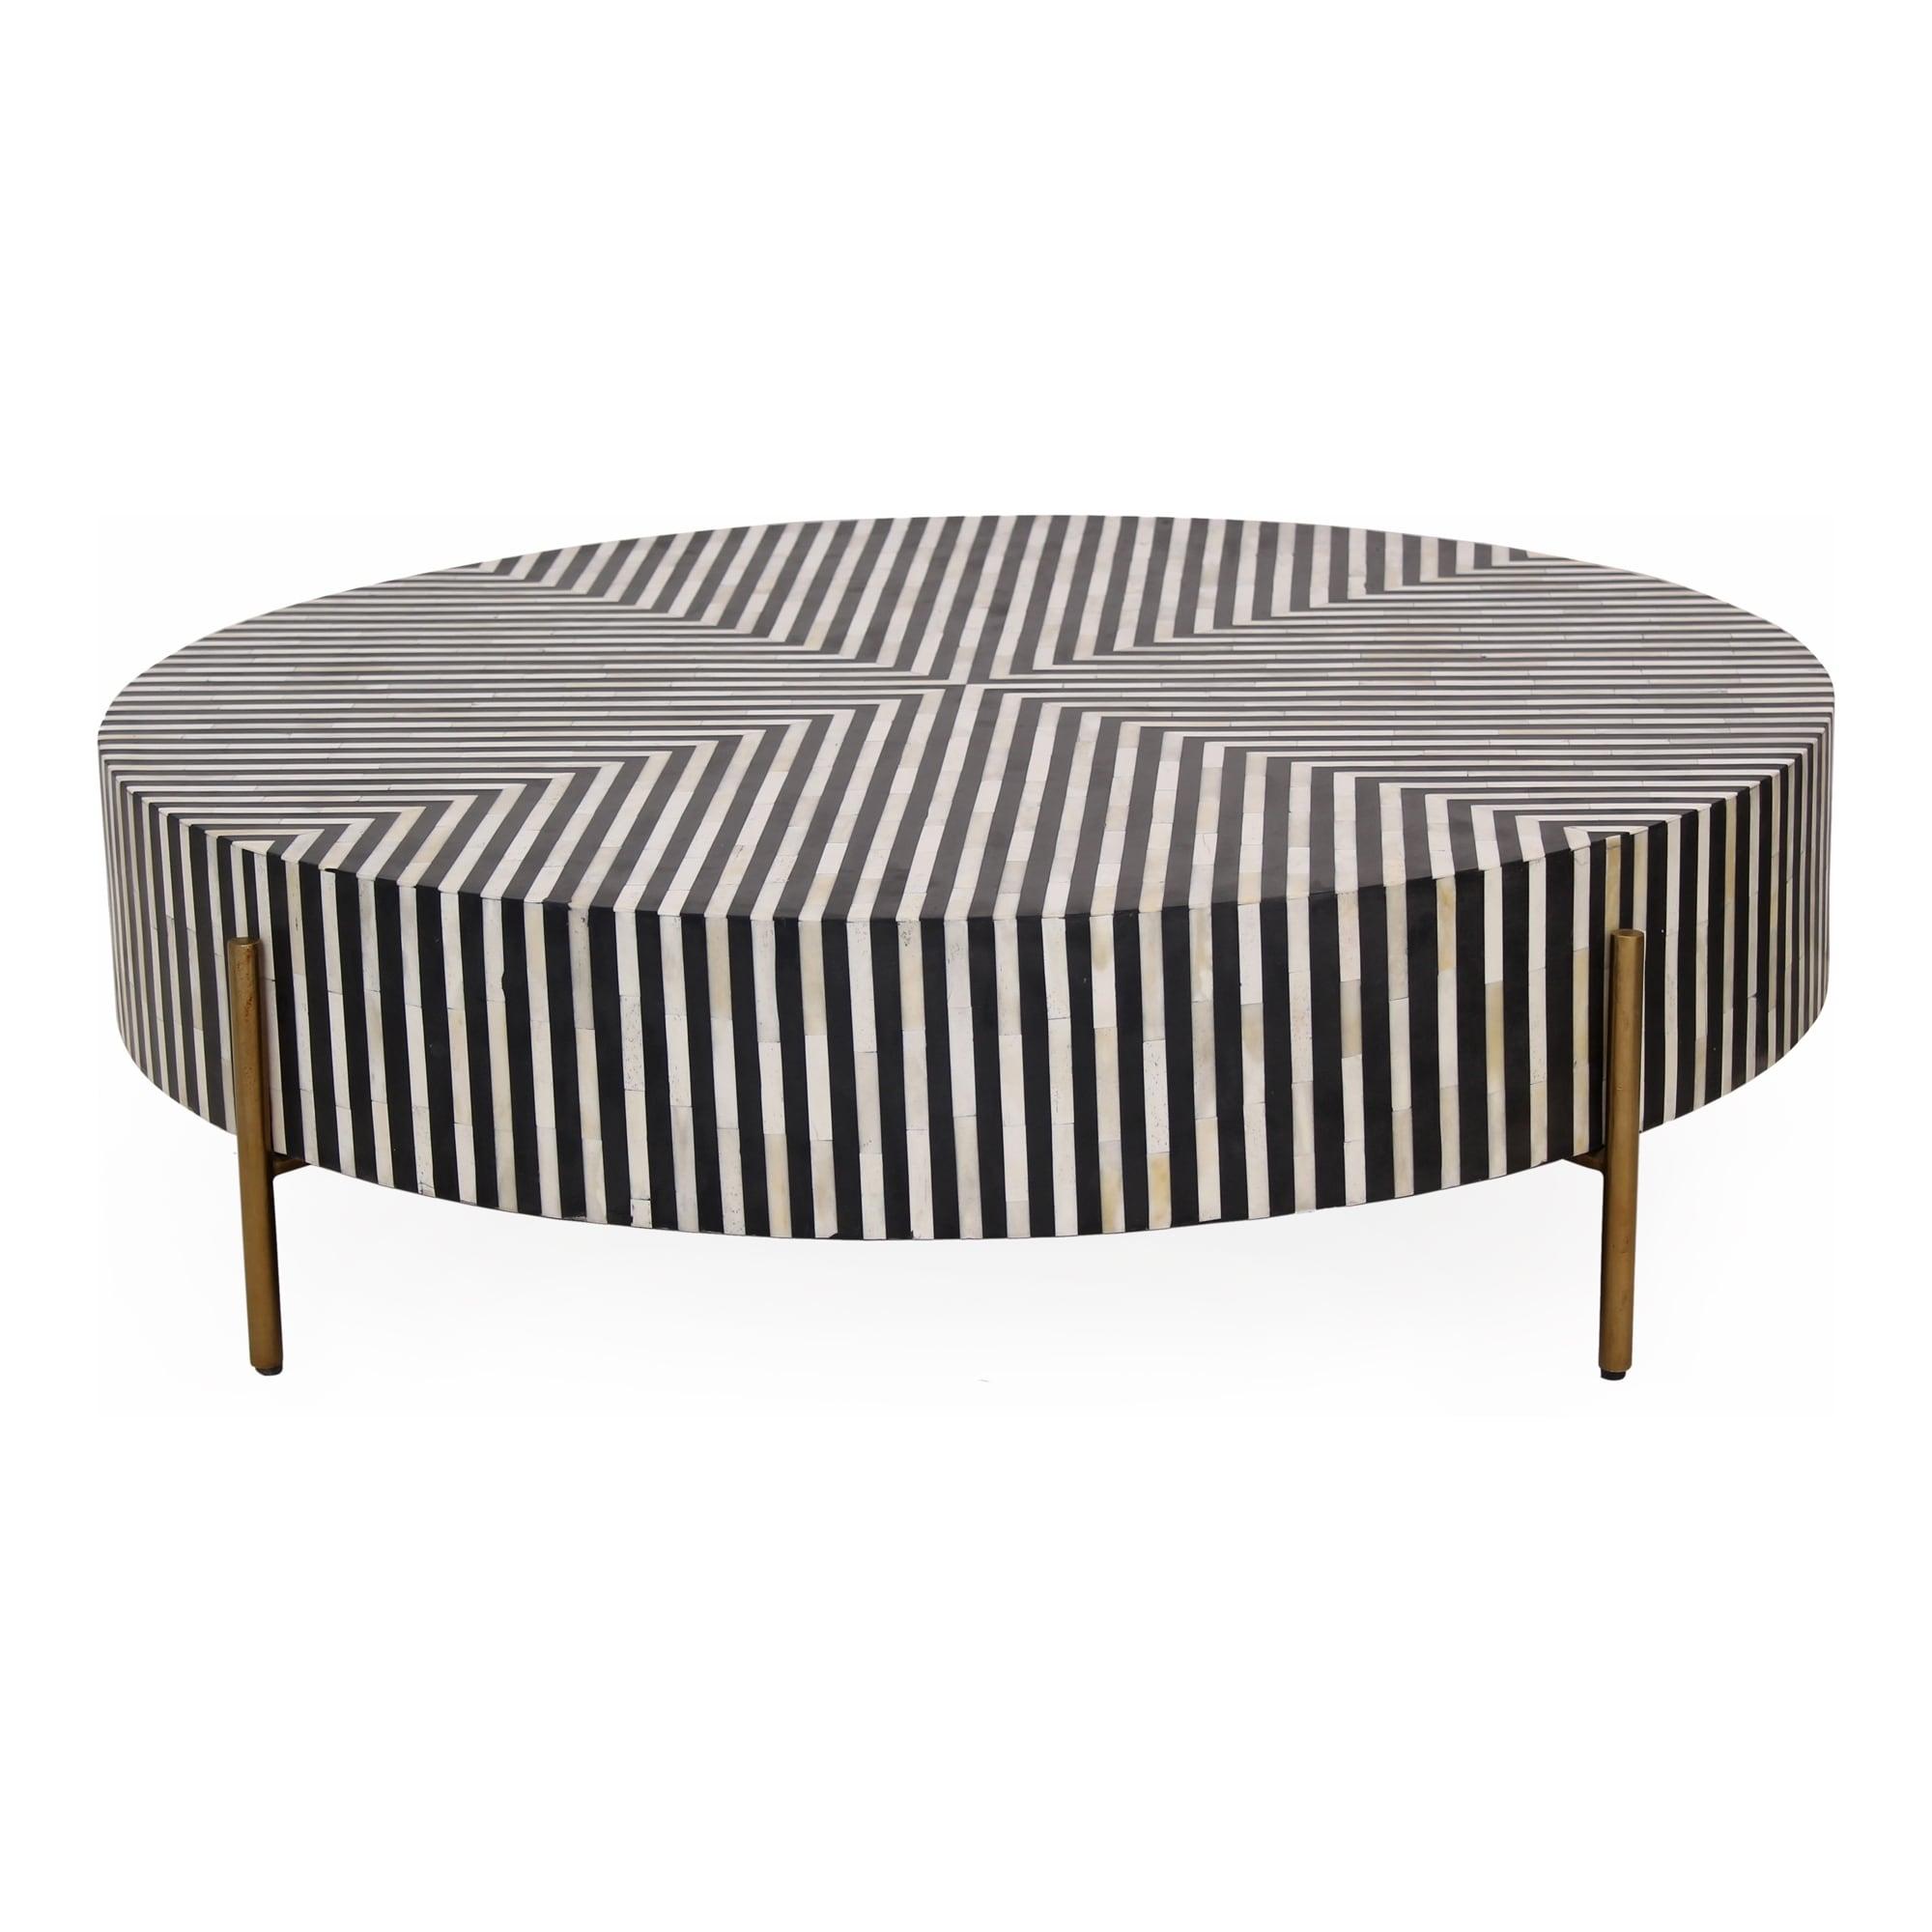 Aurelle Home Modern Large Round Camel Bone Veneer Coffee Table Overstock 31513366